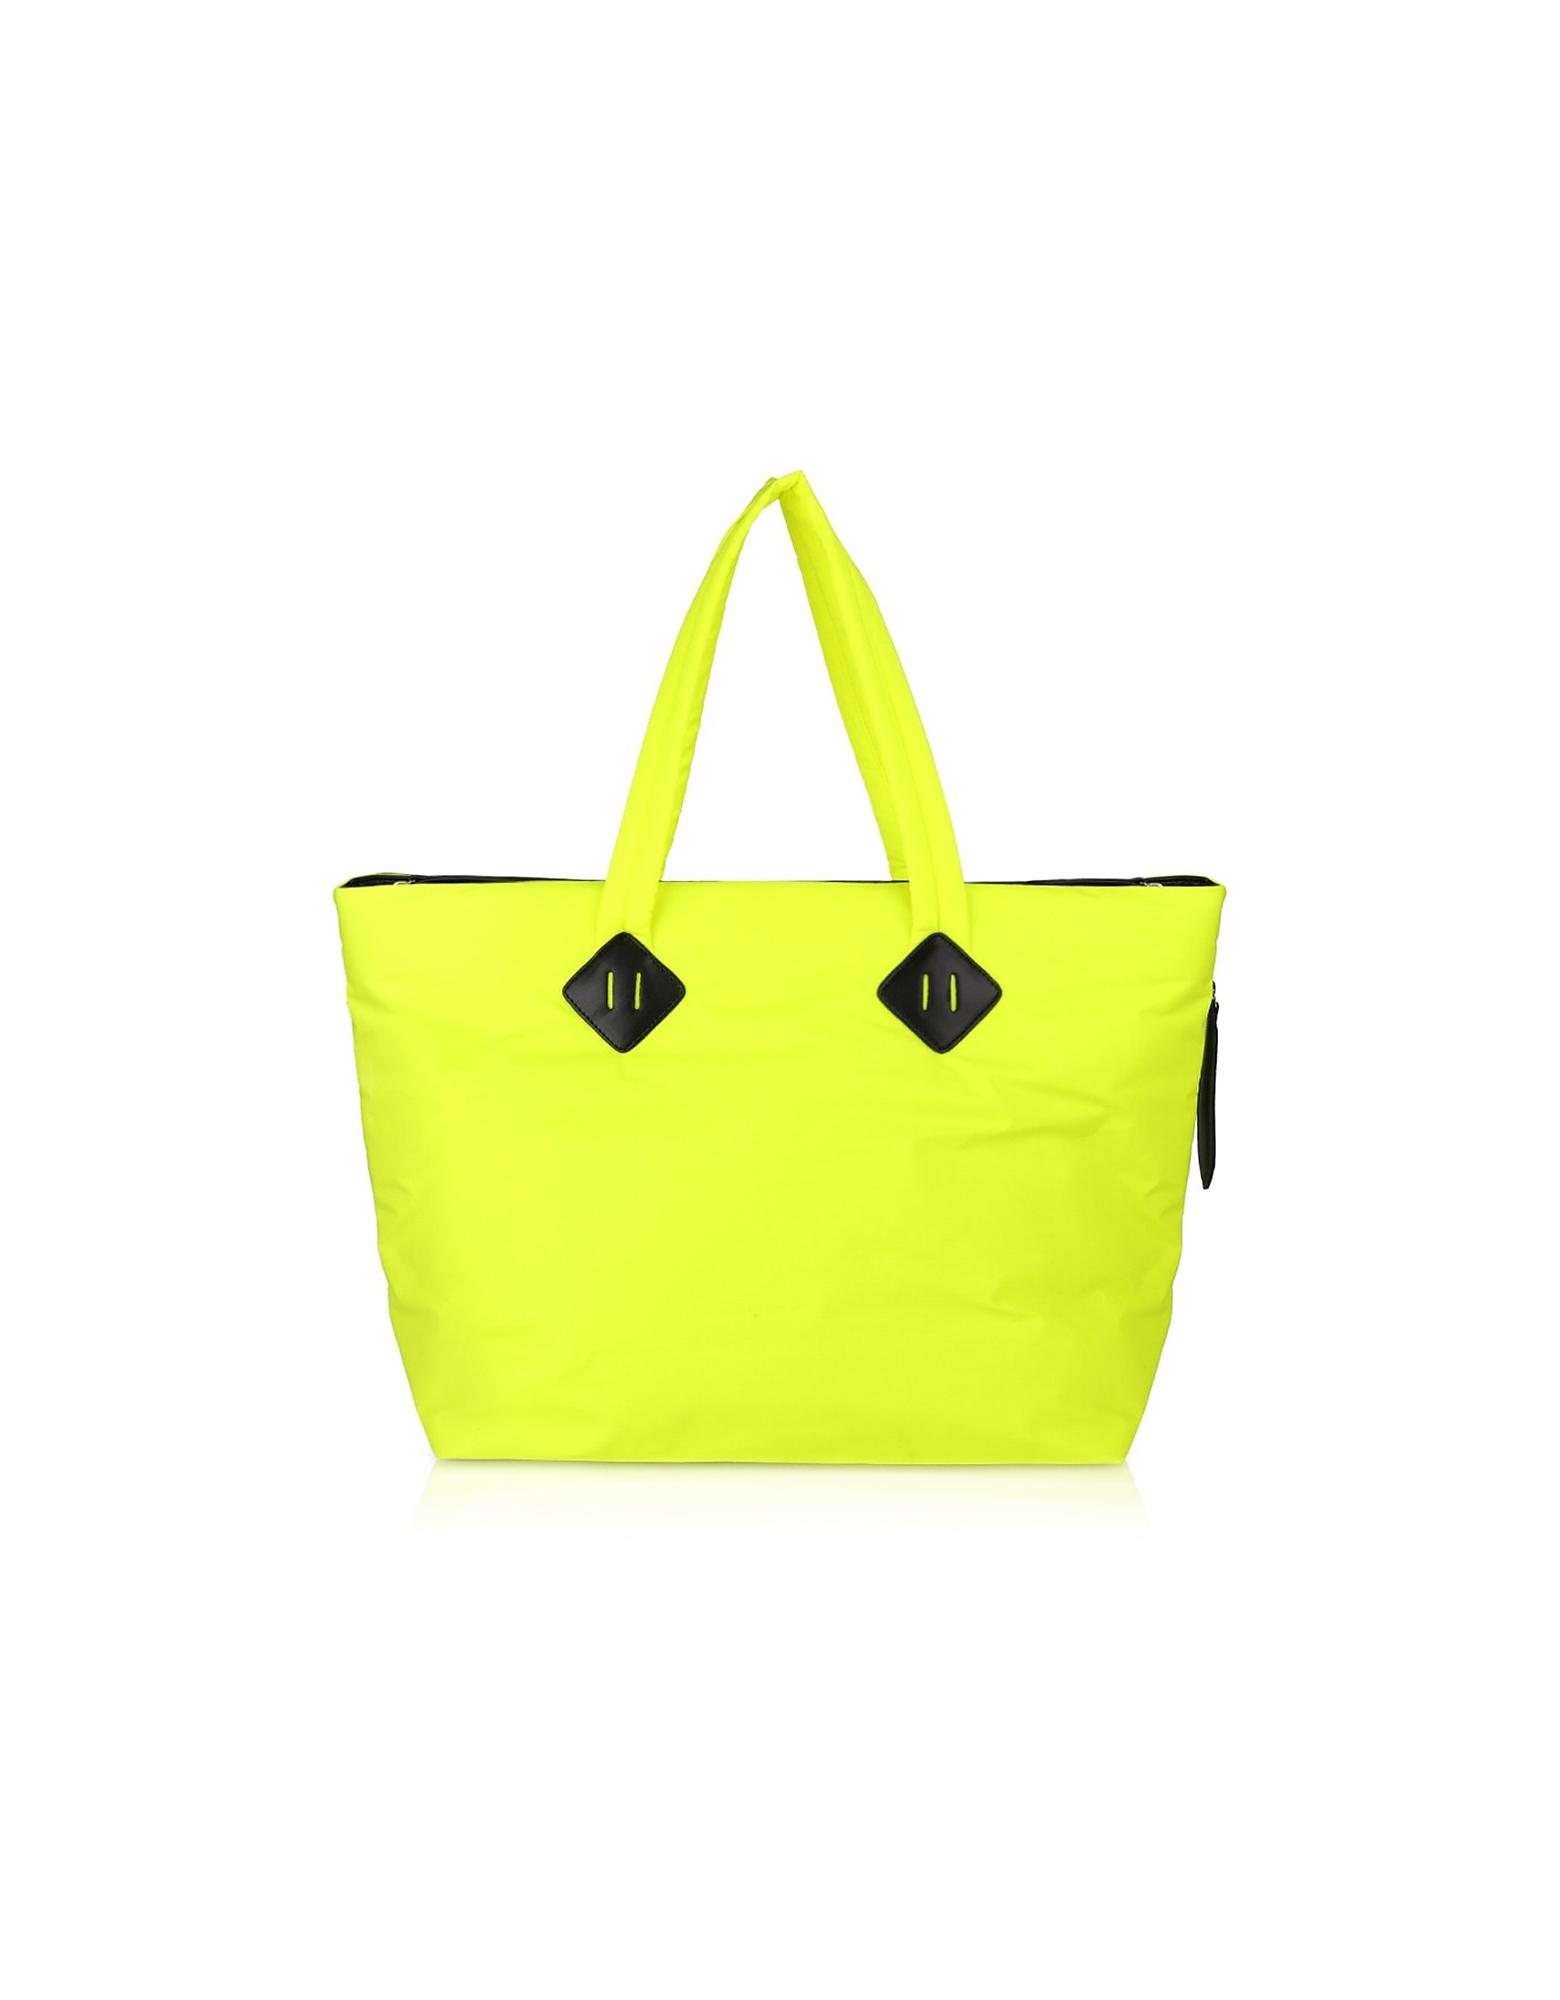 POMIKAKI Designer Handbags, Women's Yellow Bag